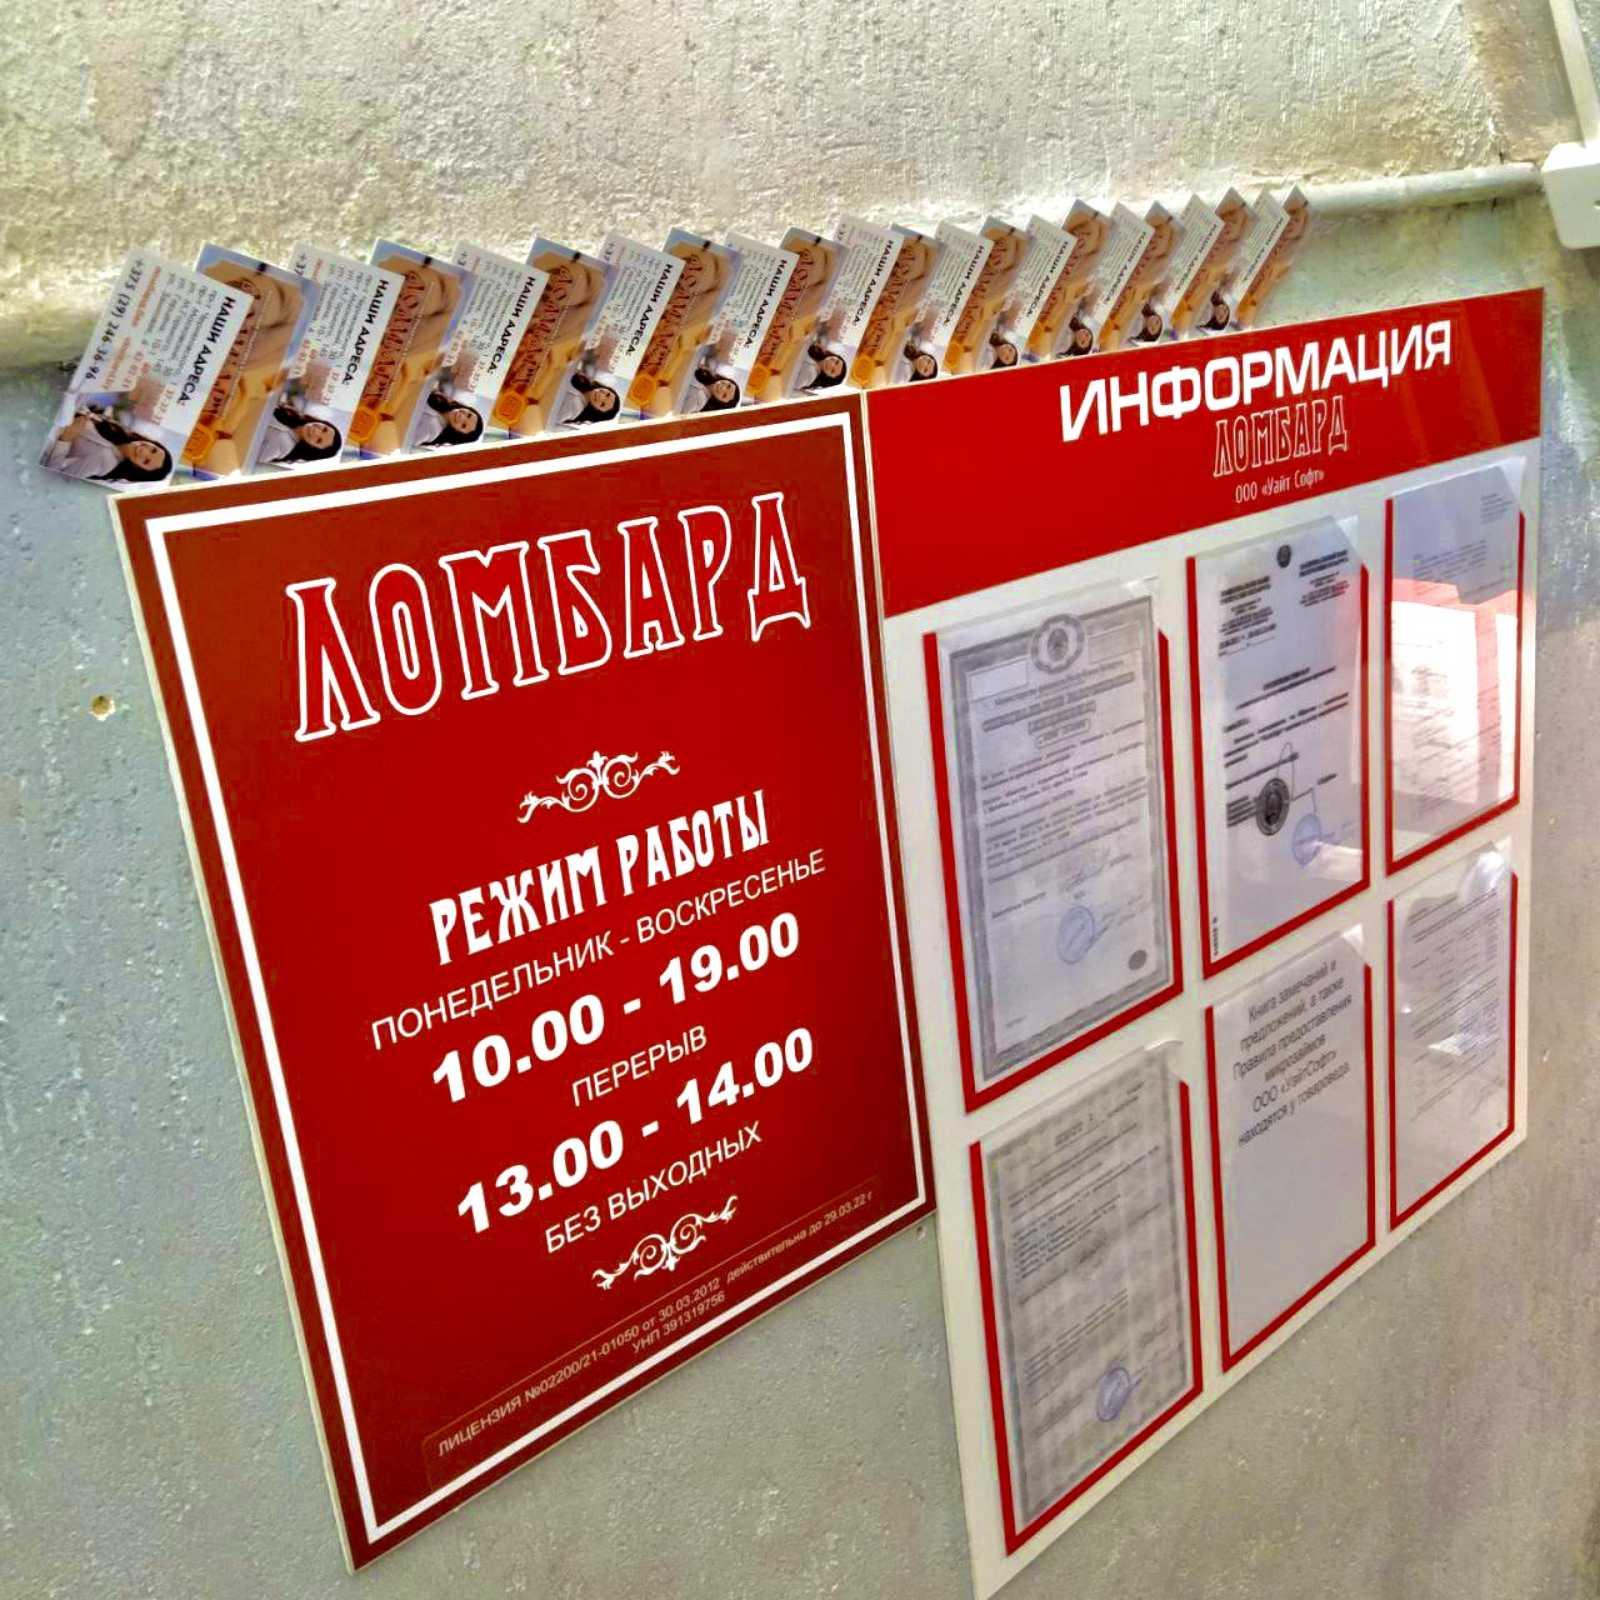 Ломбард.БЕЛ по адресу пр-т Черняховского, 1